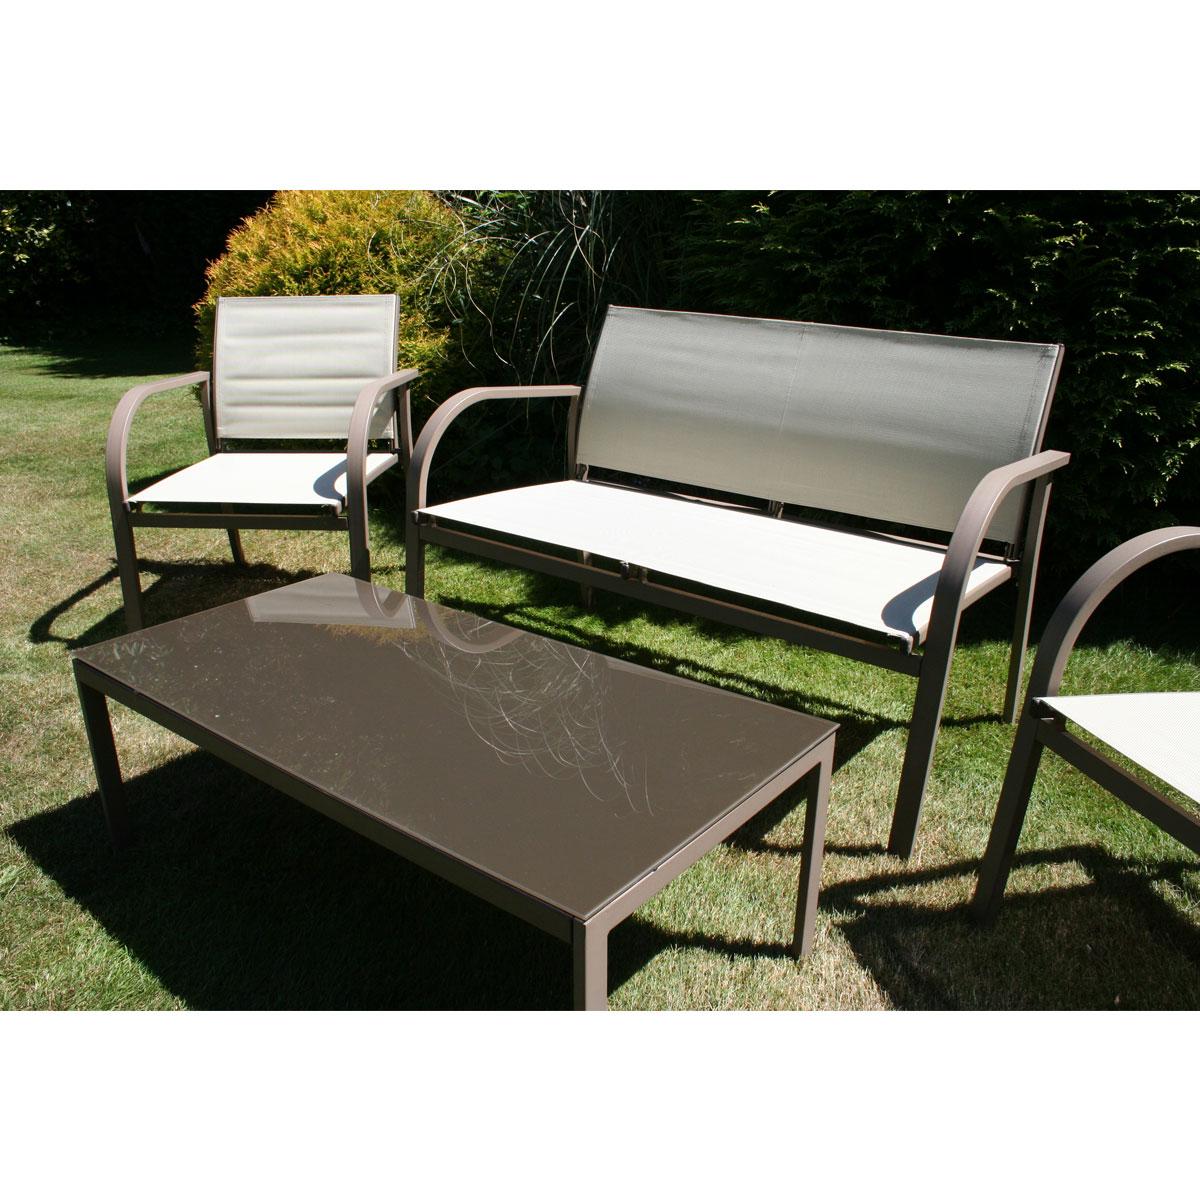 Charles Bentley Garden Modern Mesh Lounge Outdoor